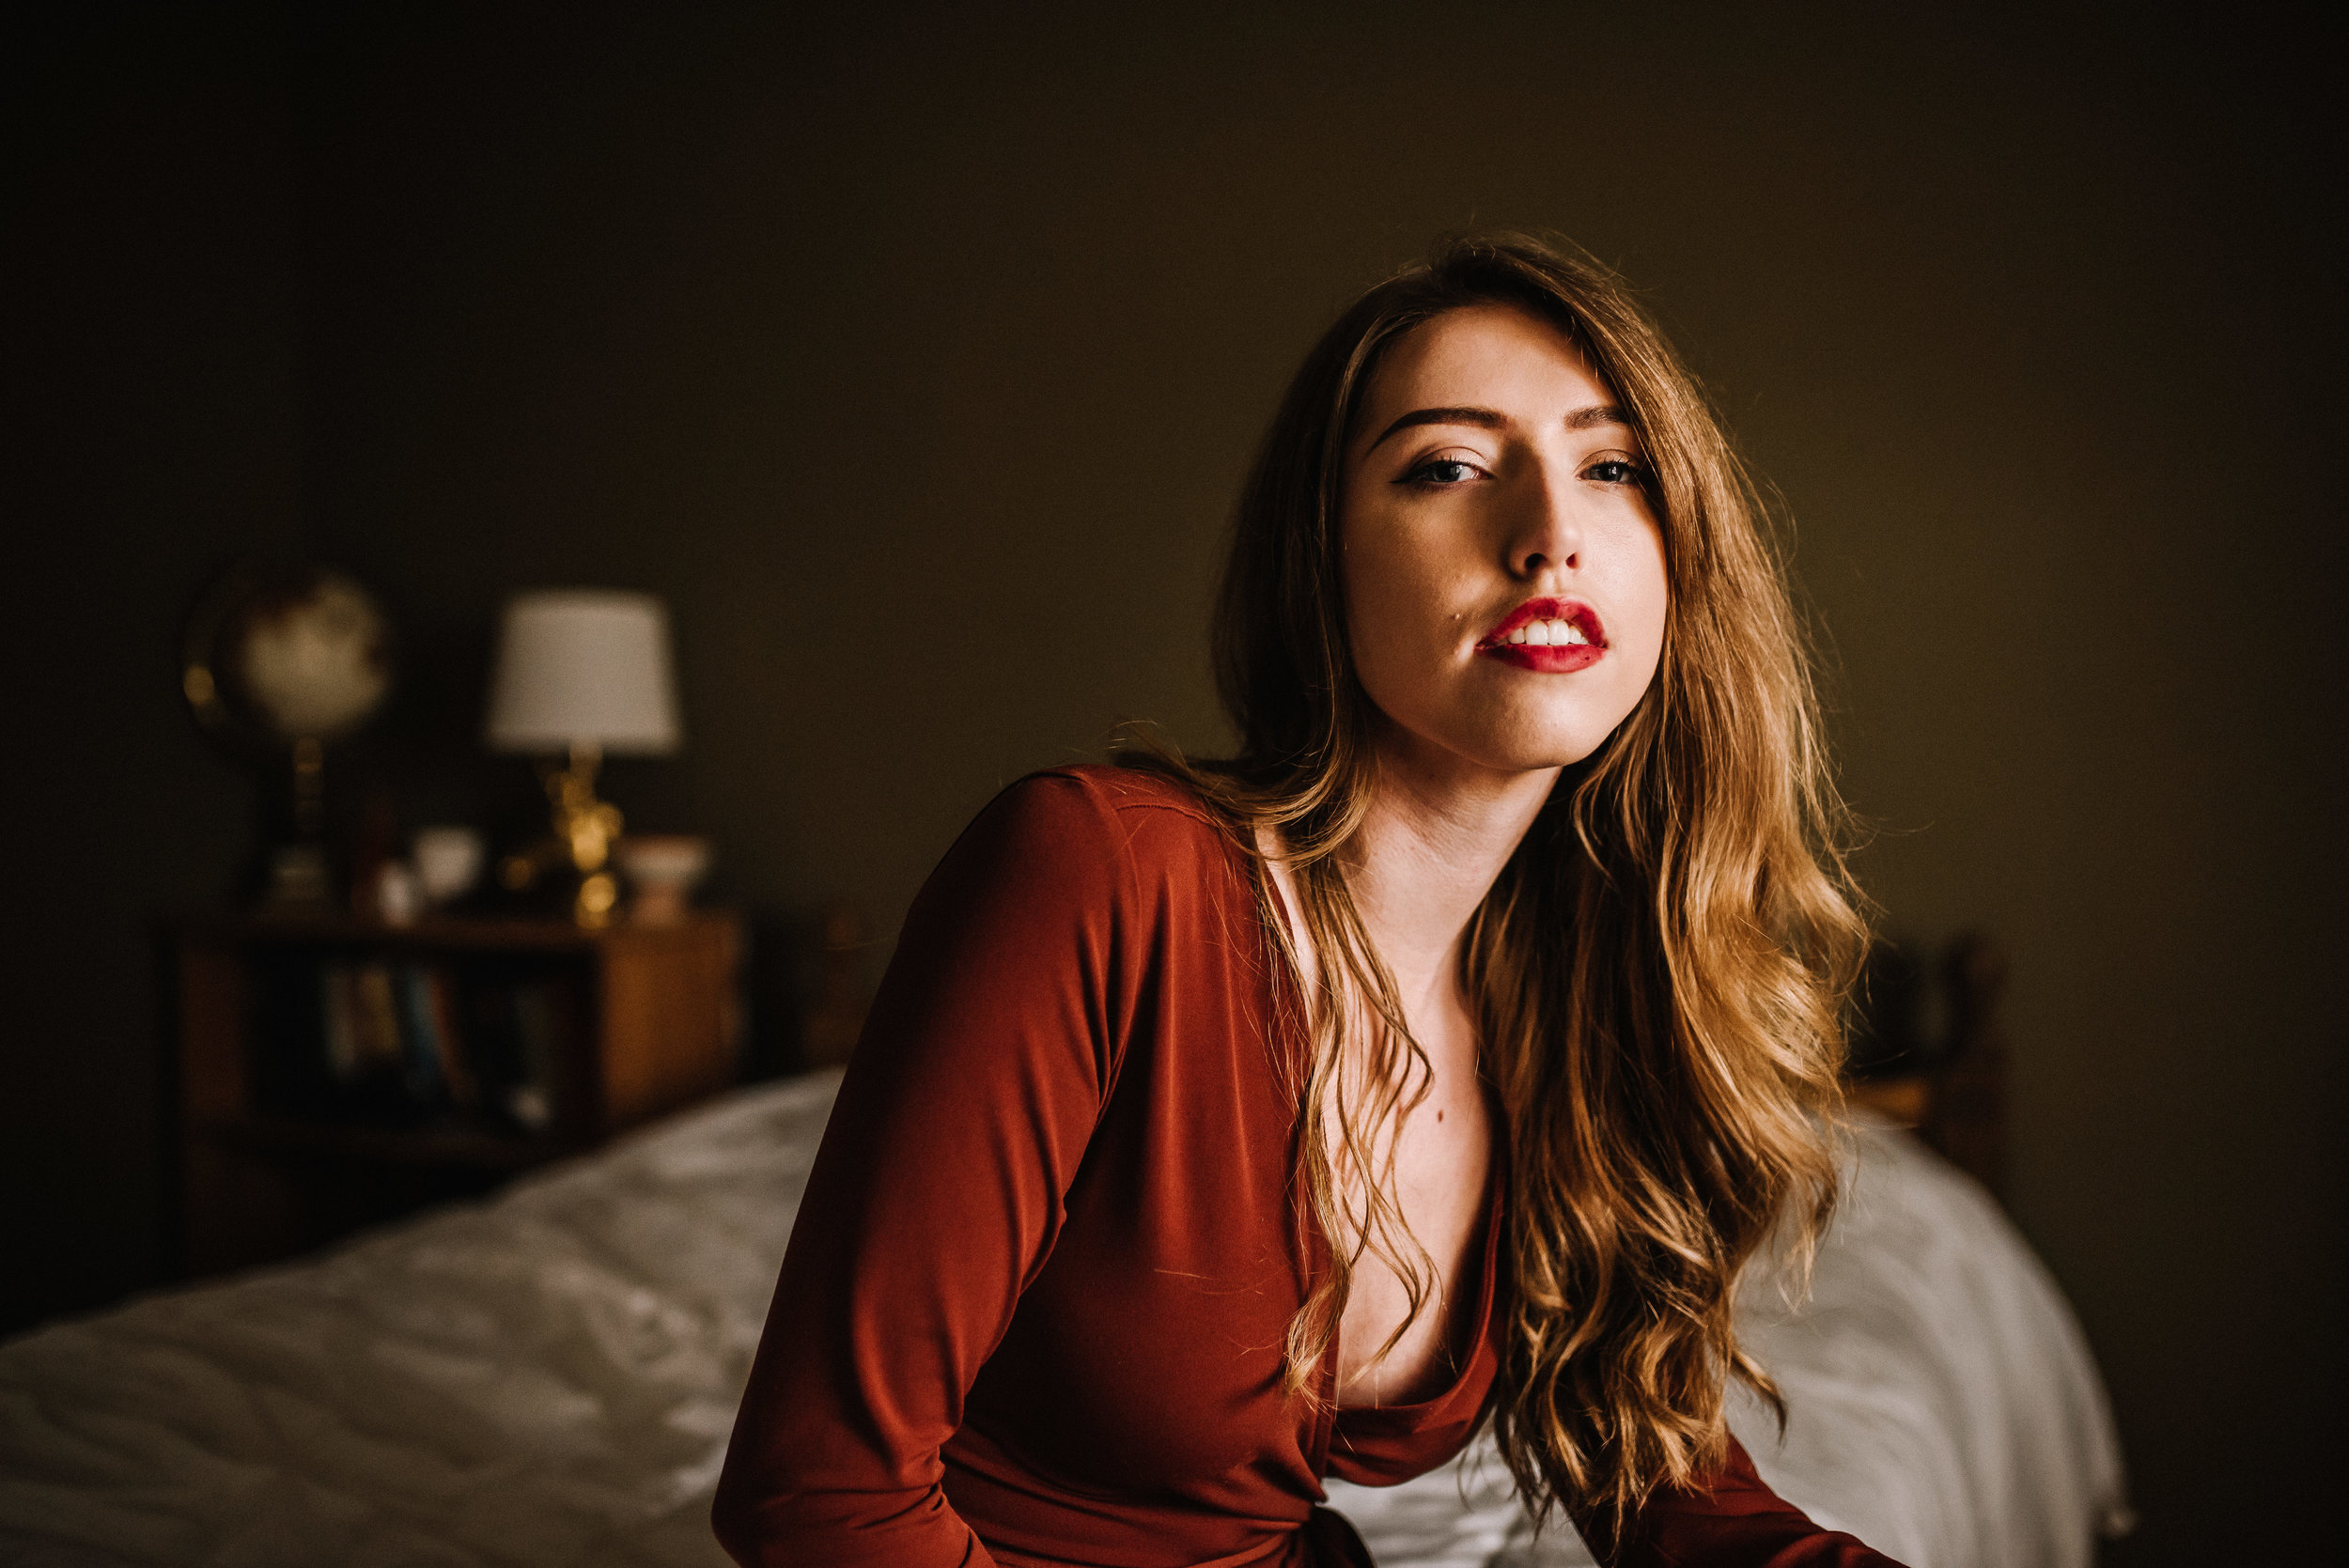 Kaitlyn_Ashley-Benham-Photography-23.jpg